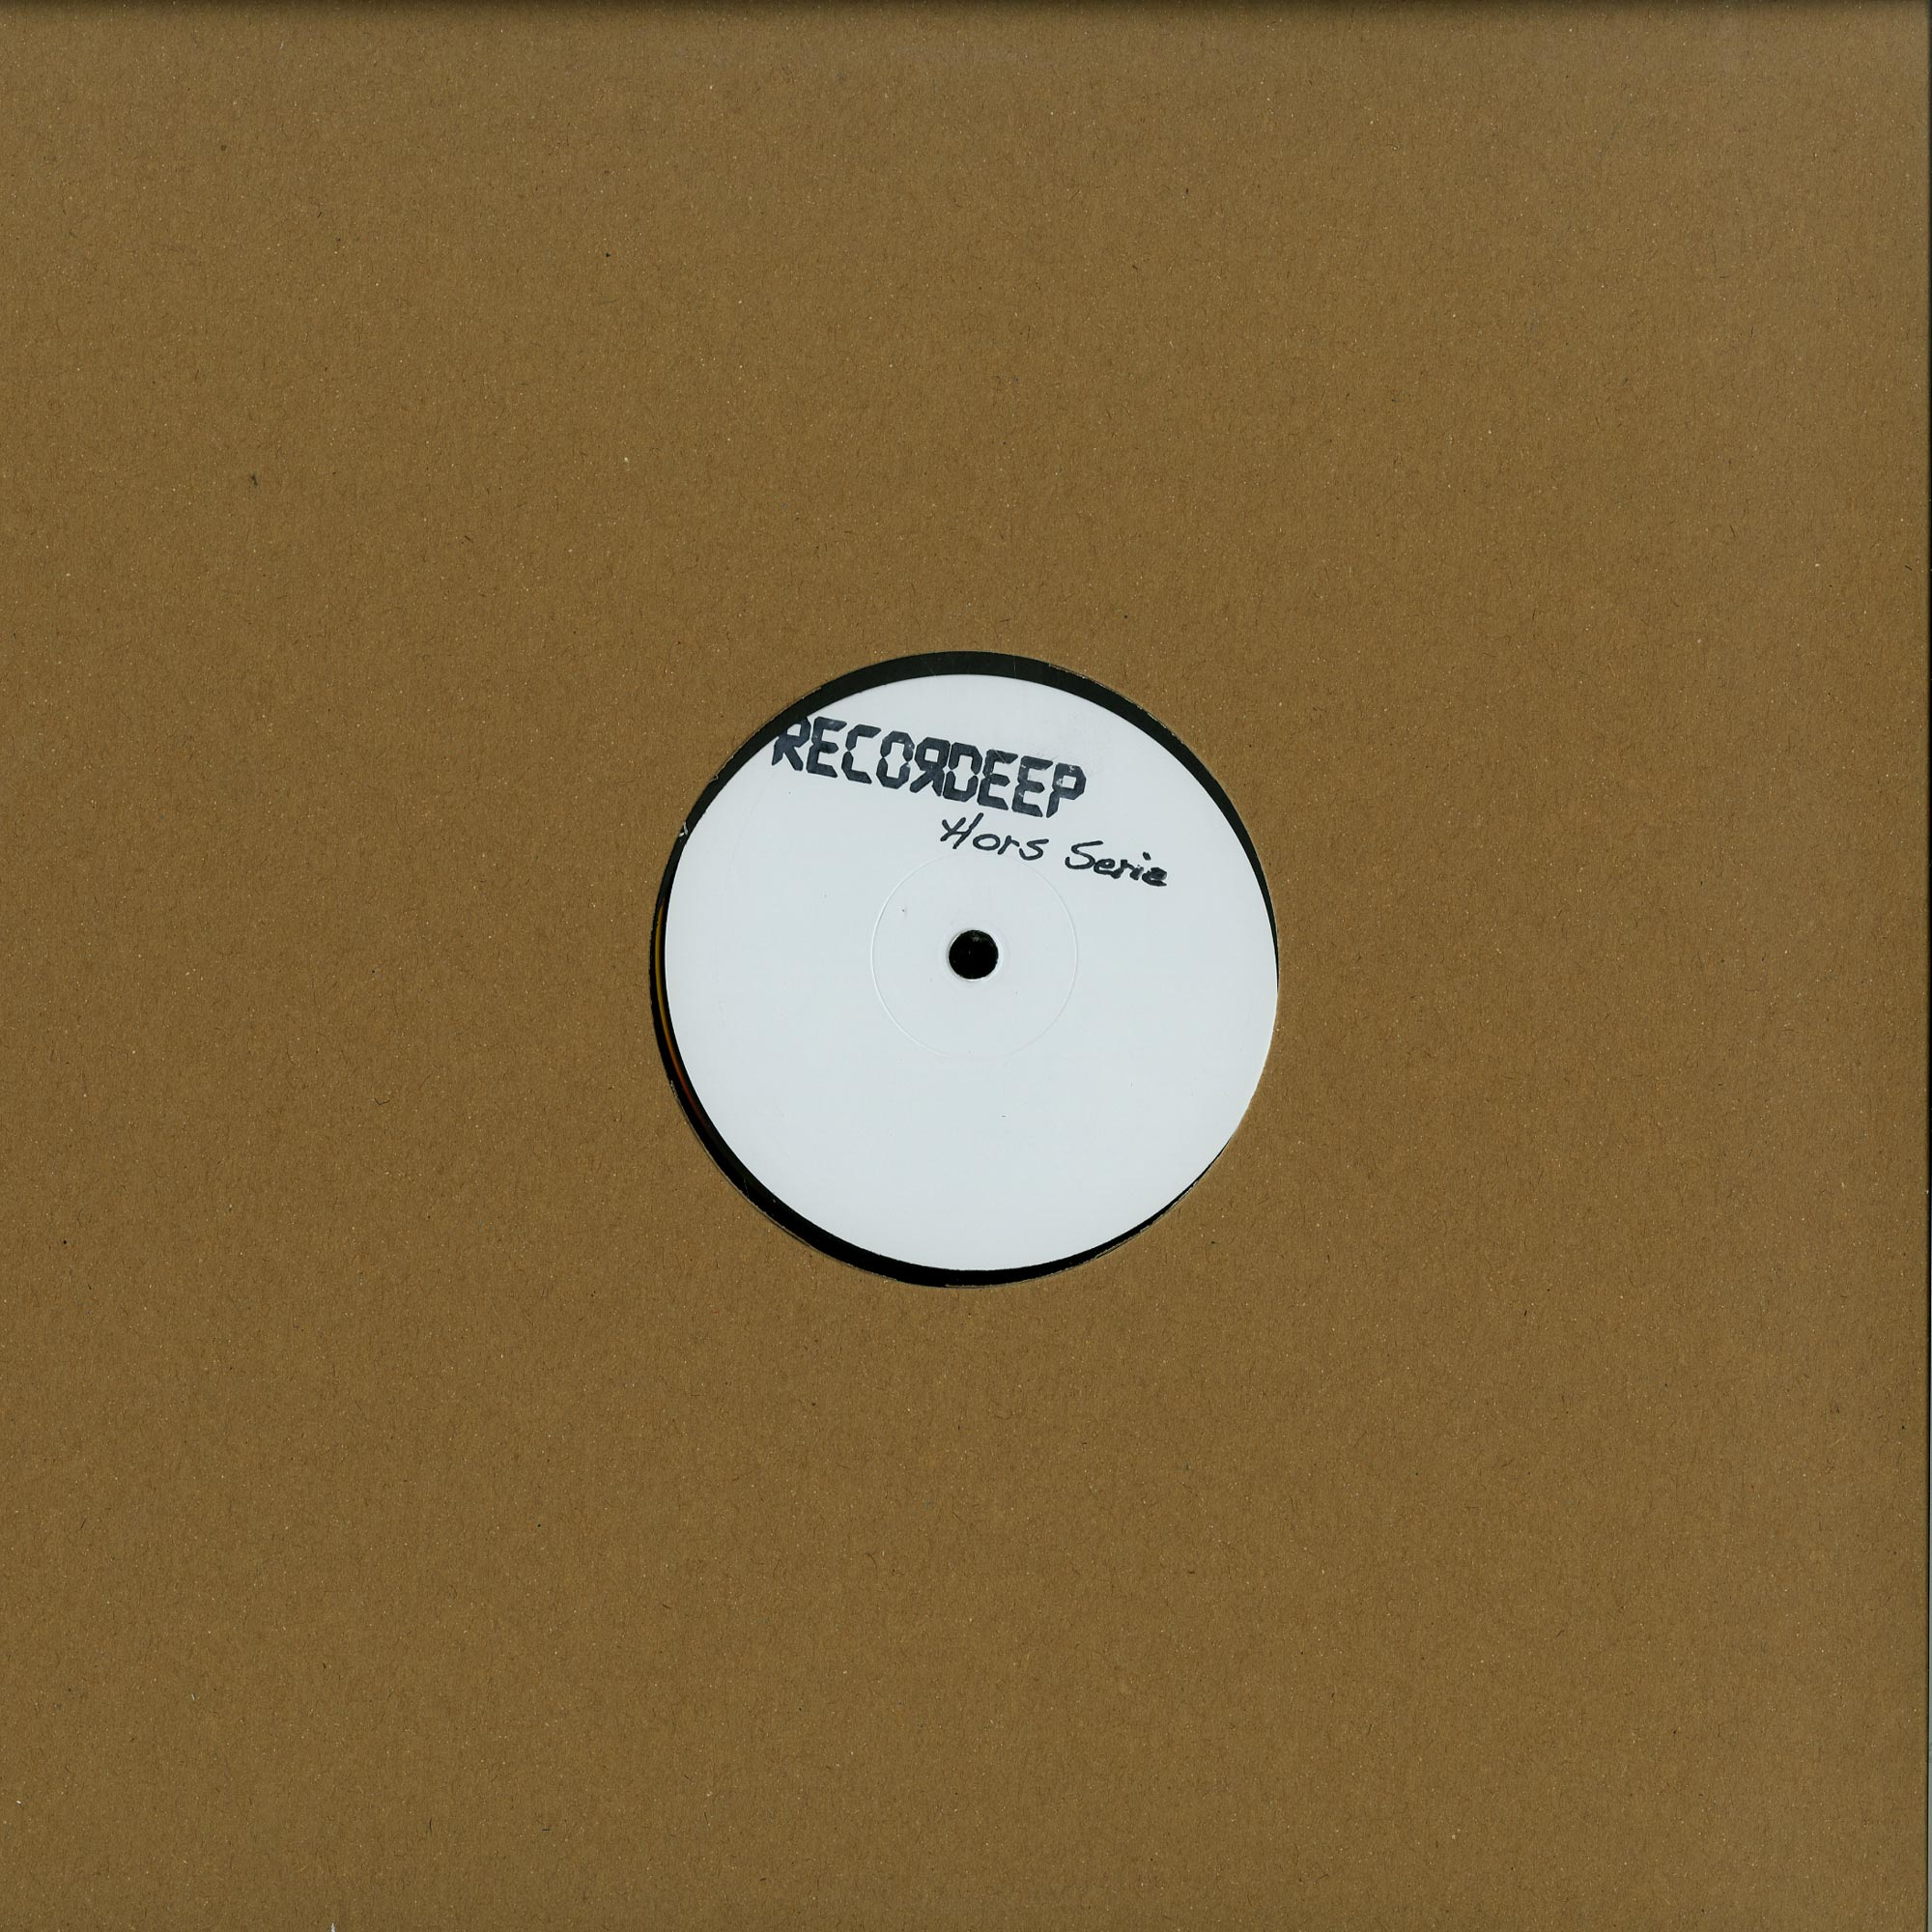 MJOG - RECORDEEP HORS SERIE 01